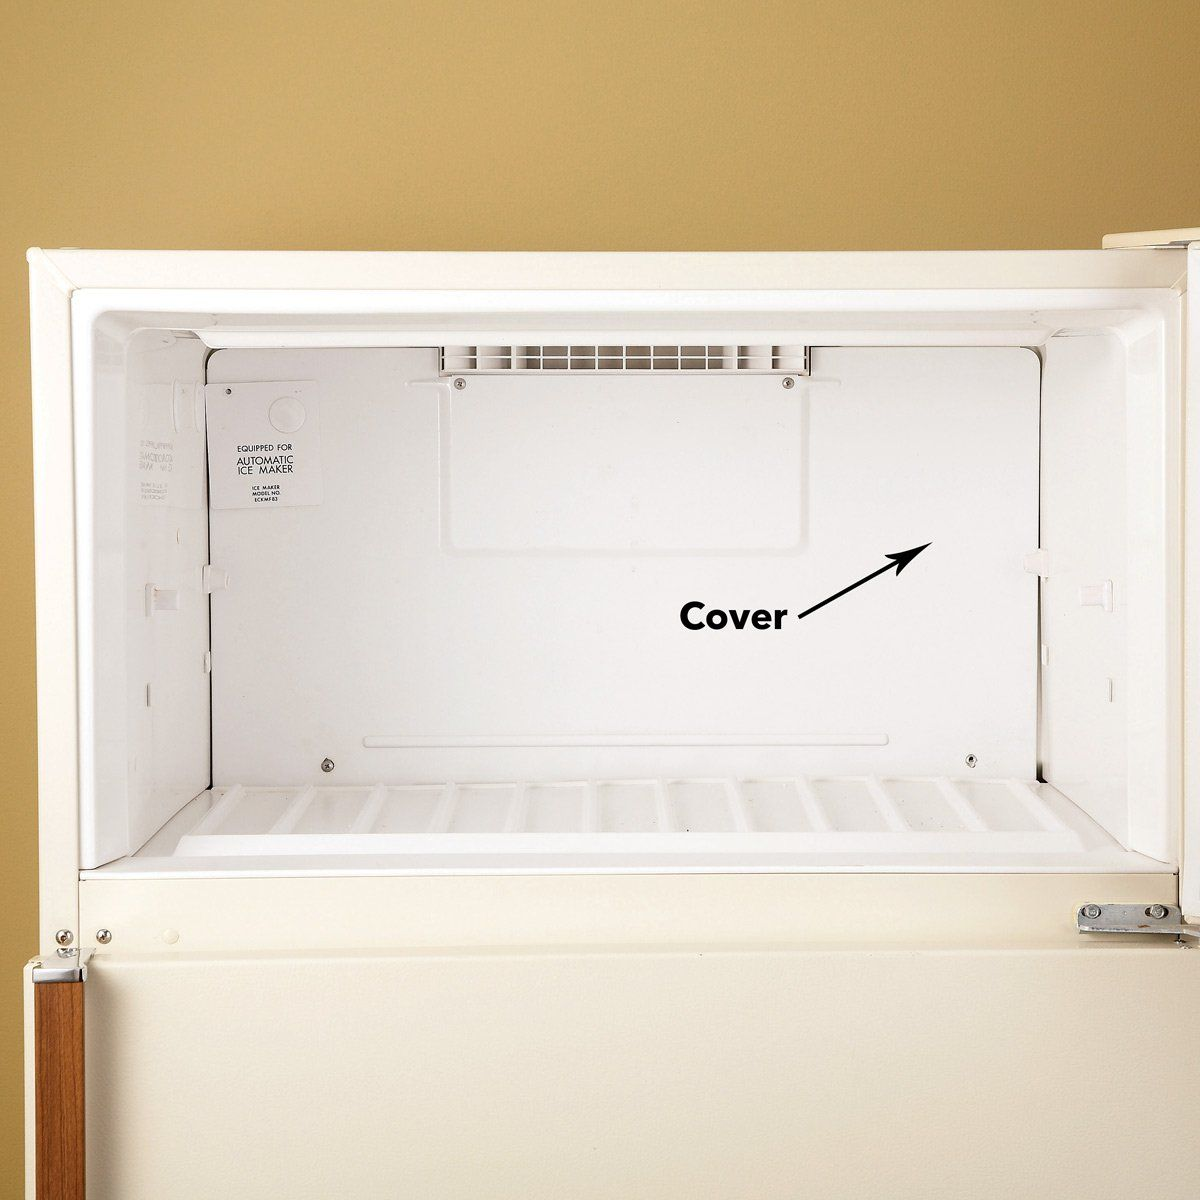 Refrigerator Repair 101 How To Fix Your Broken Refrigerator